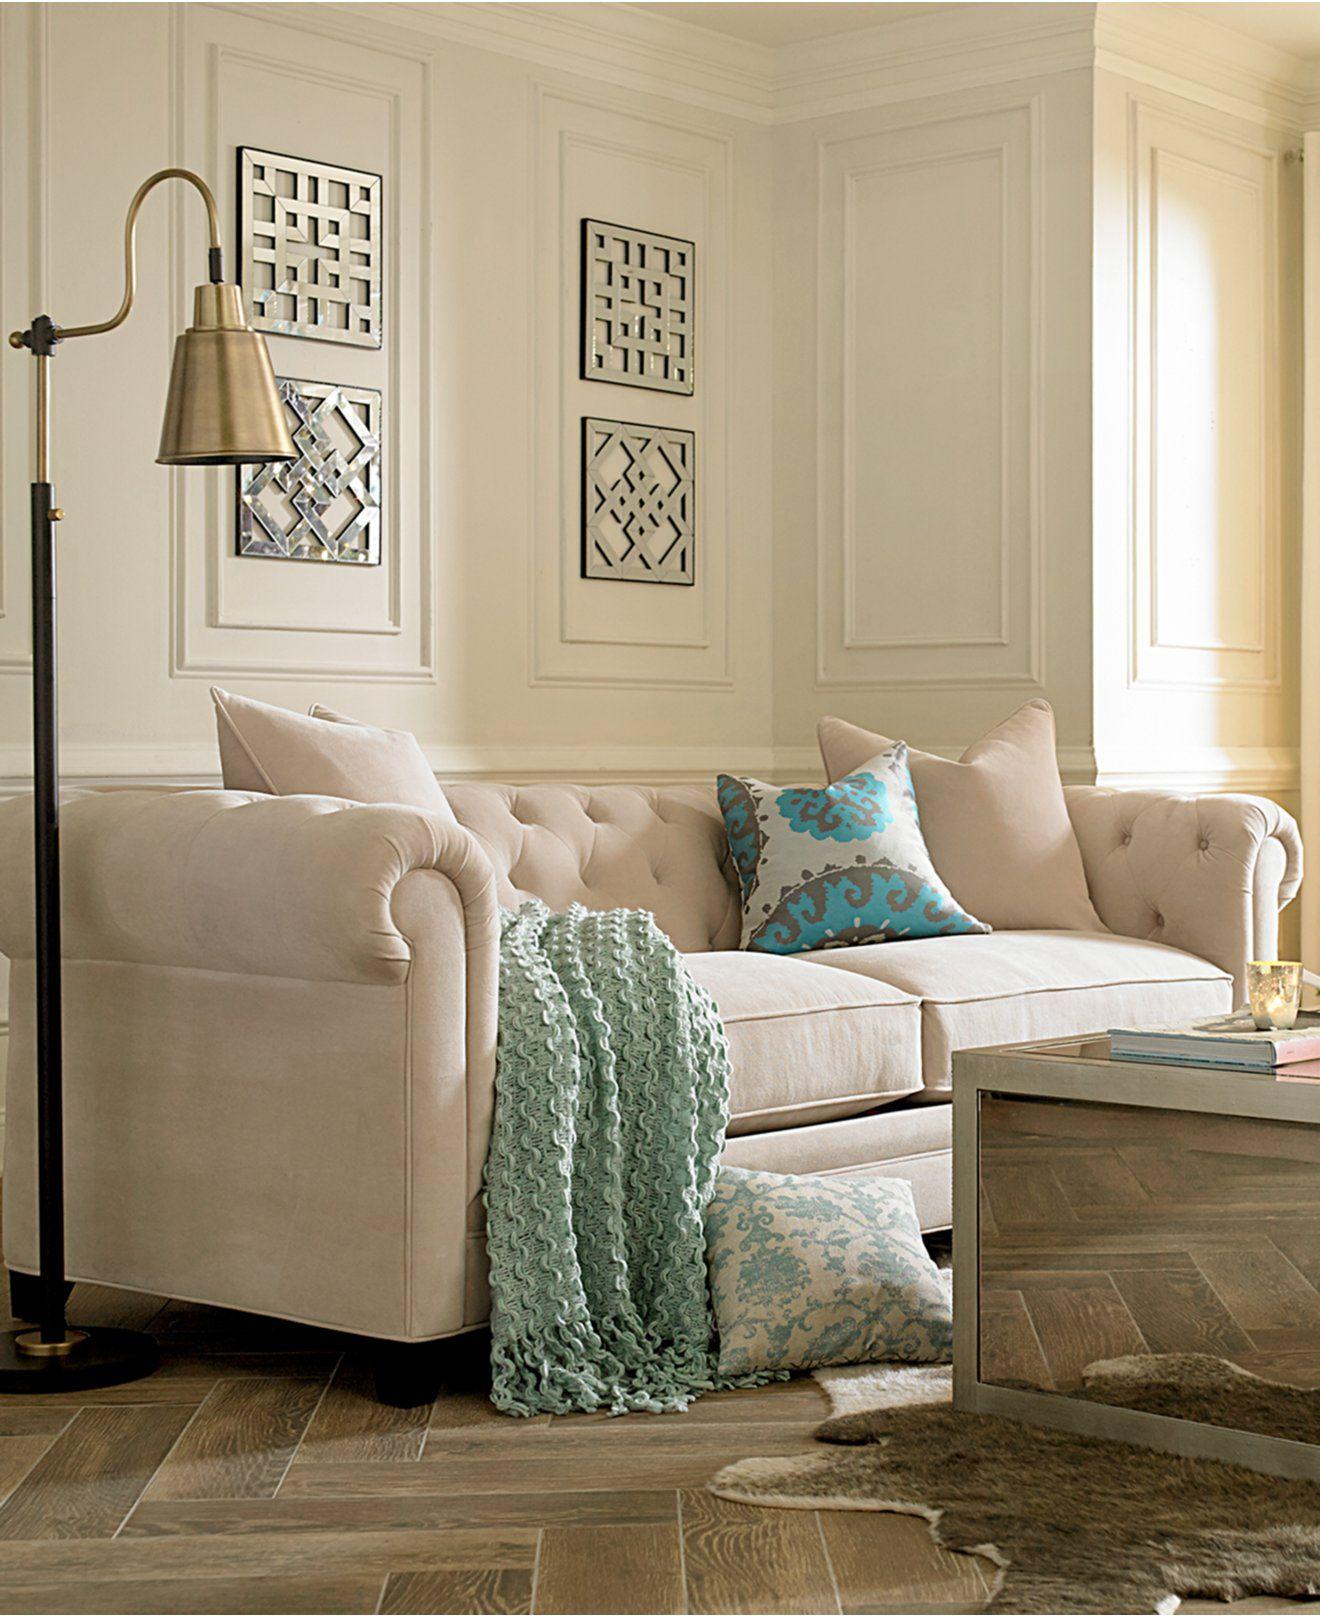 Martha Stewart Collection Saybridge 92 Living Room Furniture Collections Living Room Furniture Furniture Martha stewart living room ideas